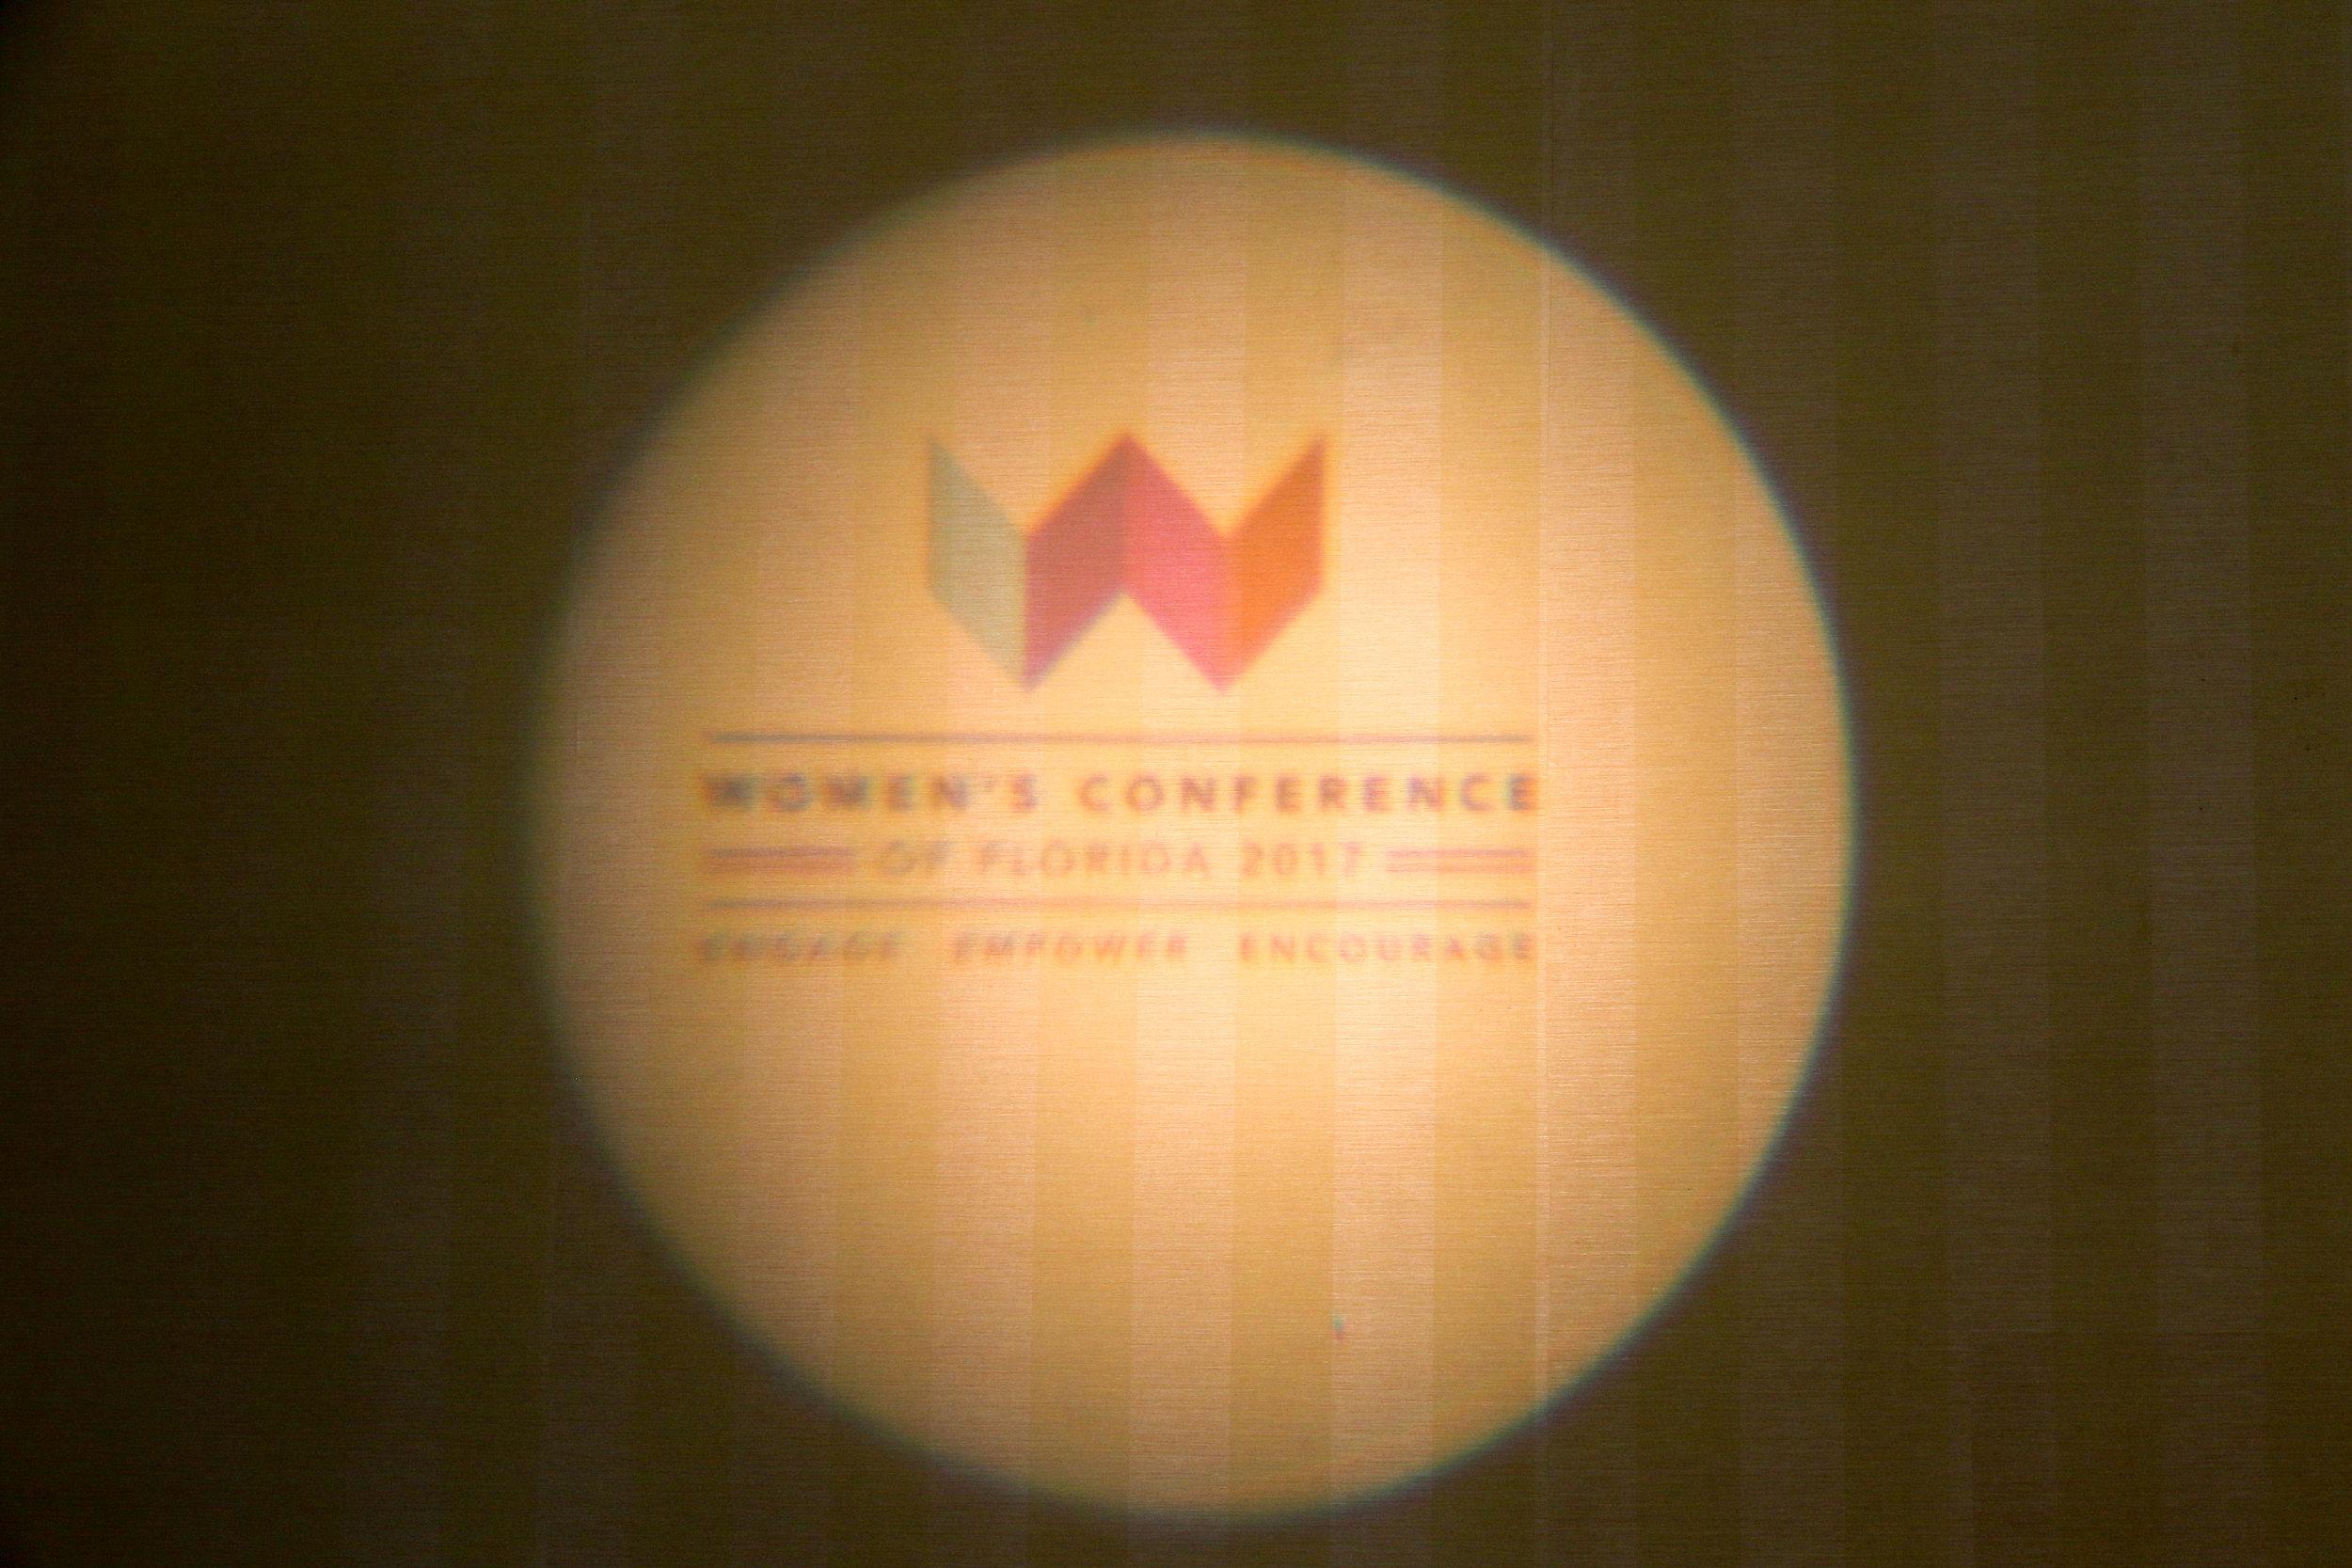 260_WomensConference_10-26-17.jpg